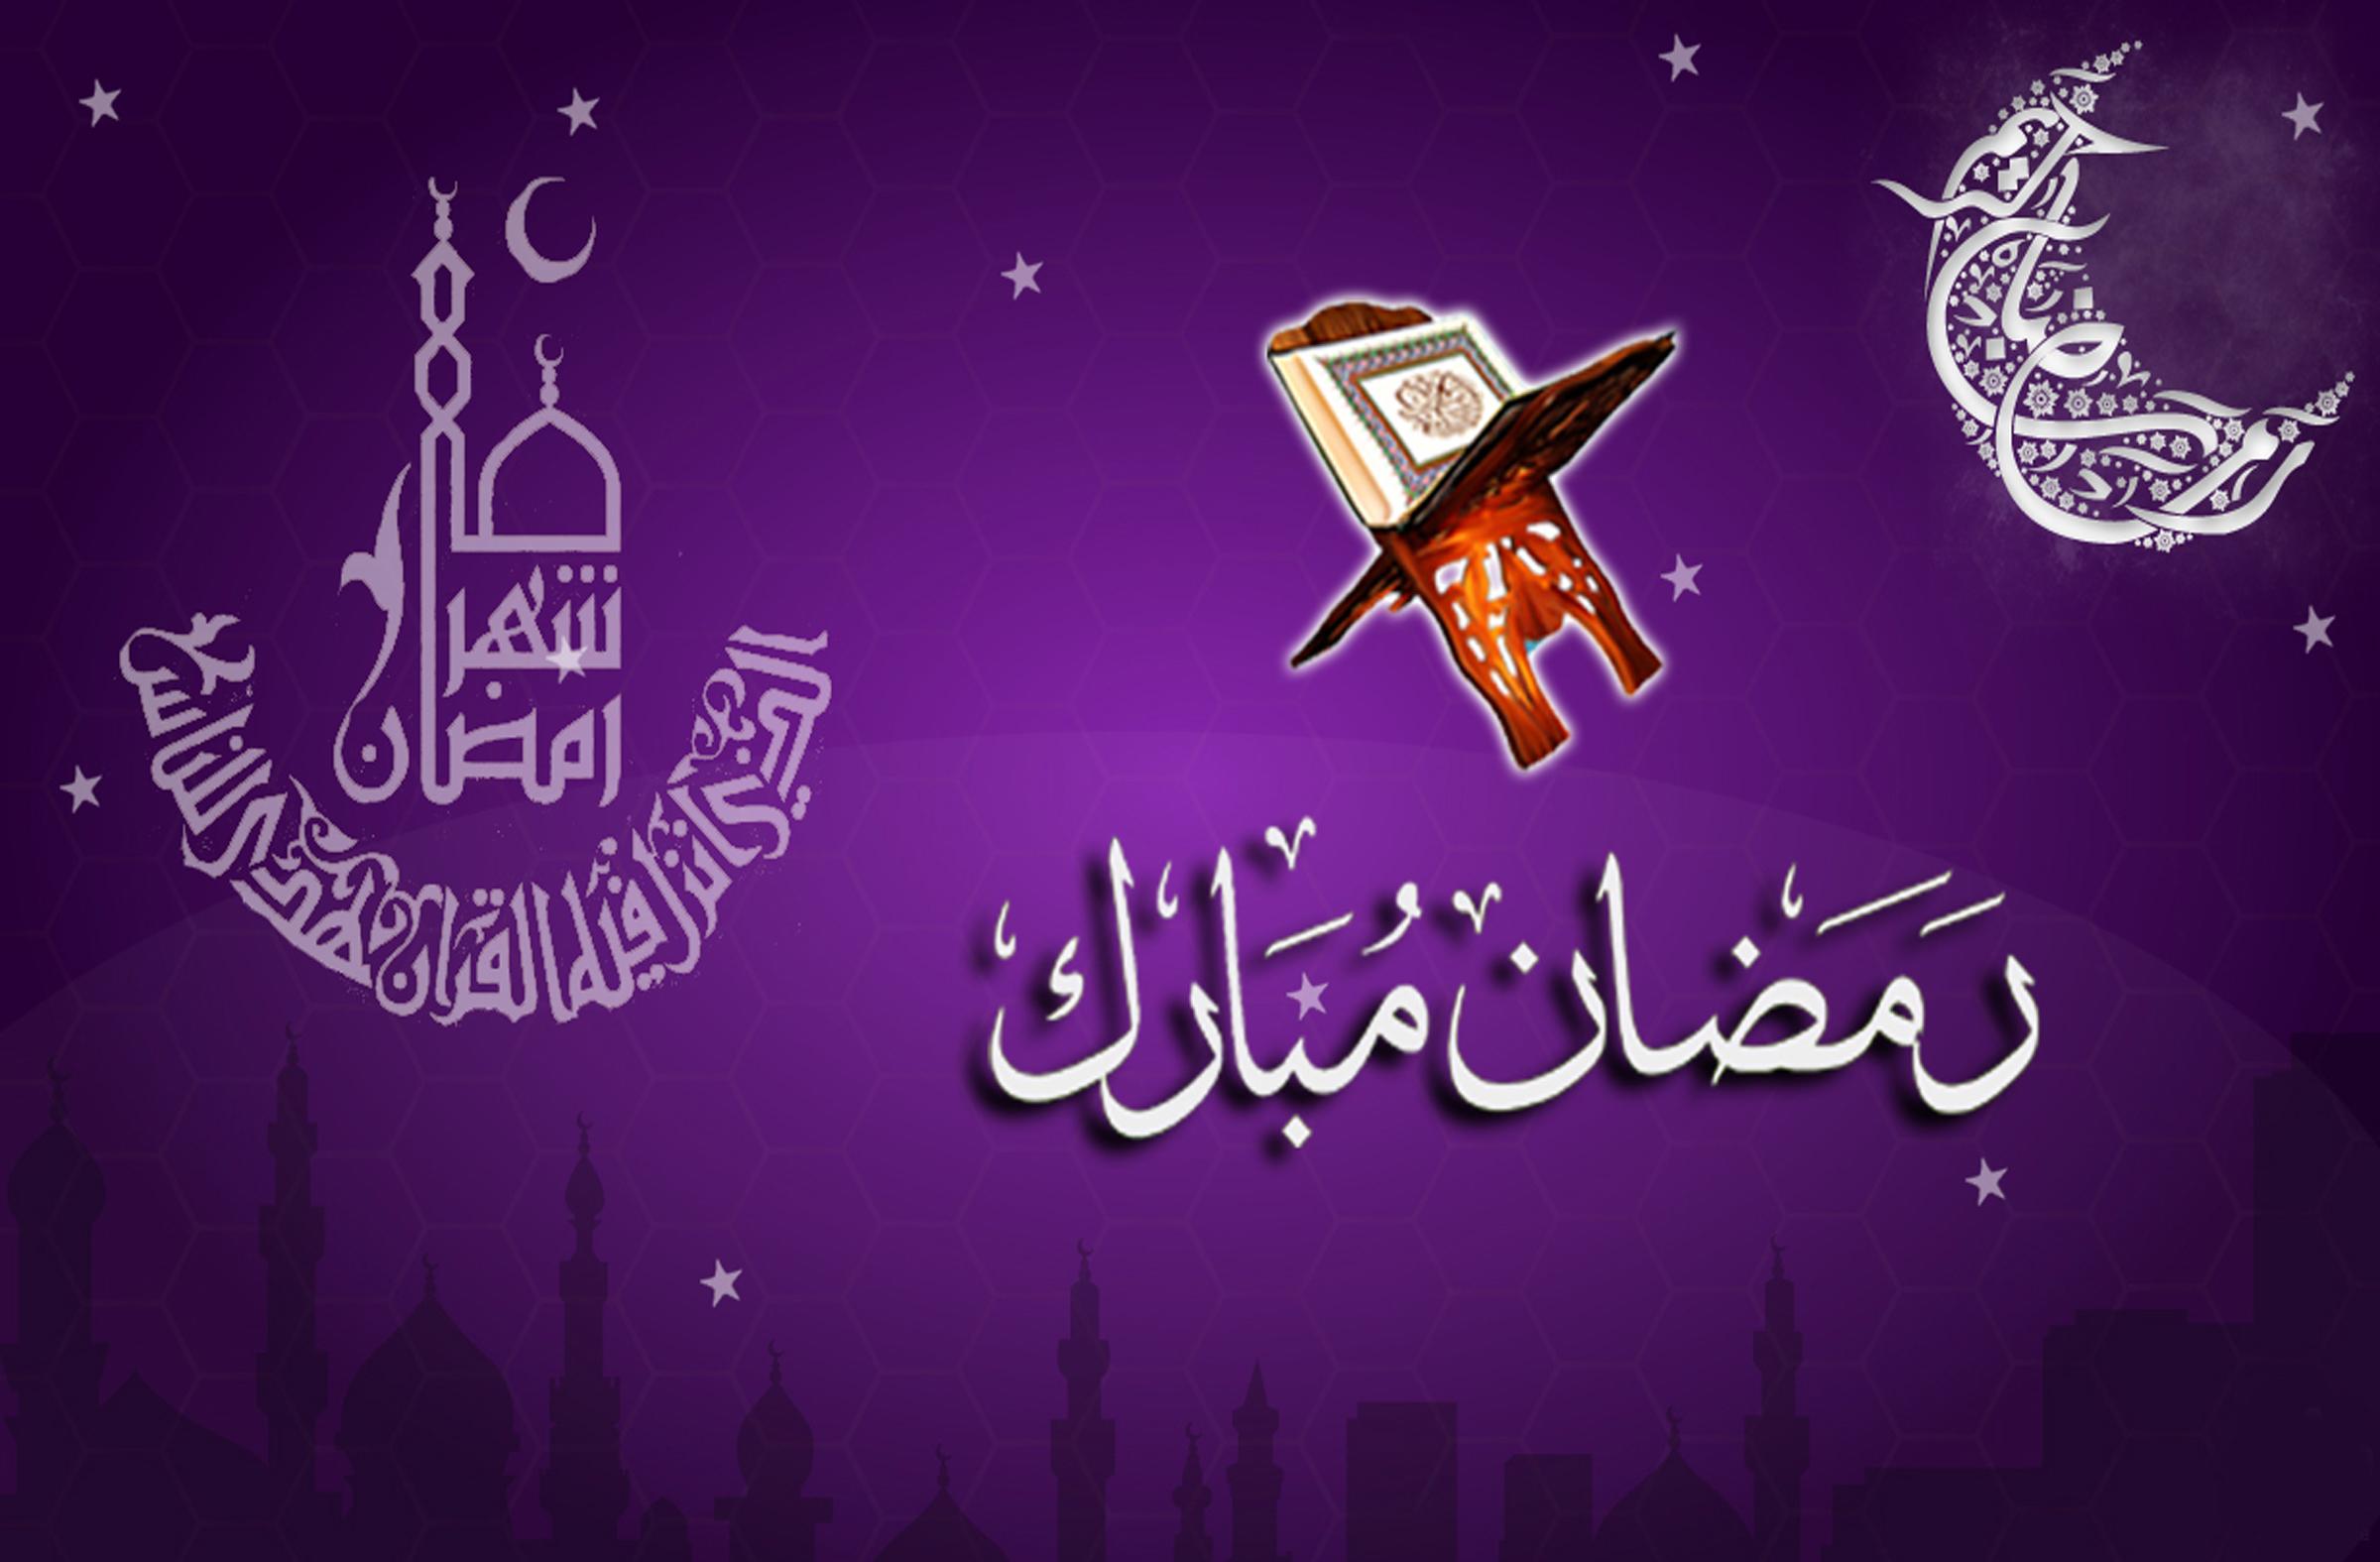 صور رمضان 2020 أجمل صور فوانيس رمضان 2021 بطاقات تهنئة لرمضان تهنئة رمضان بالأسماء 5